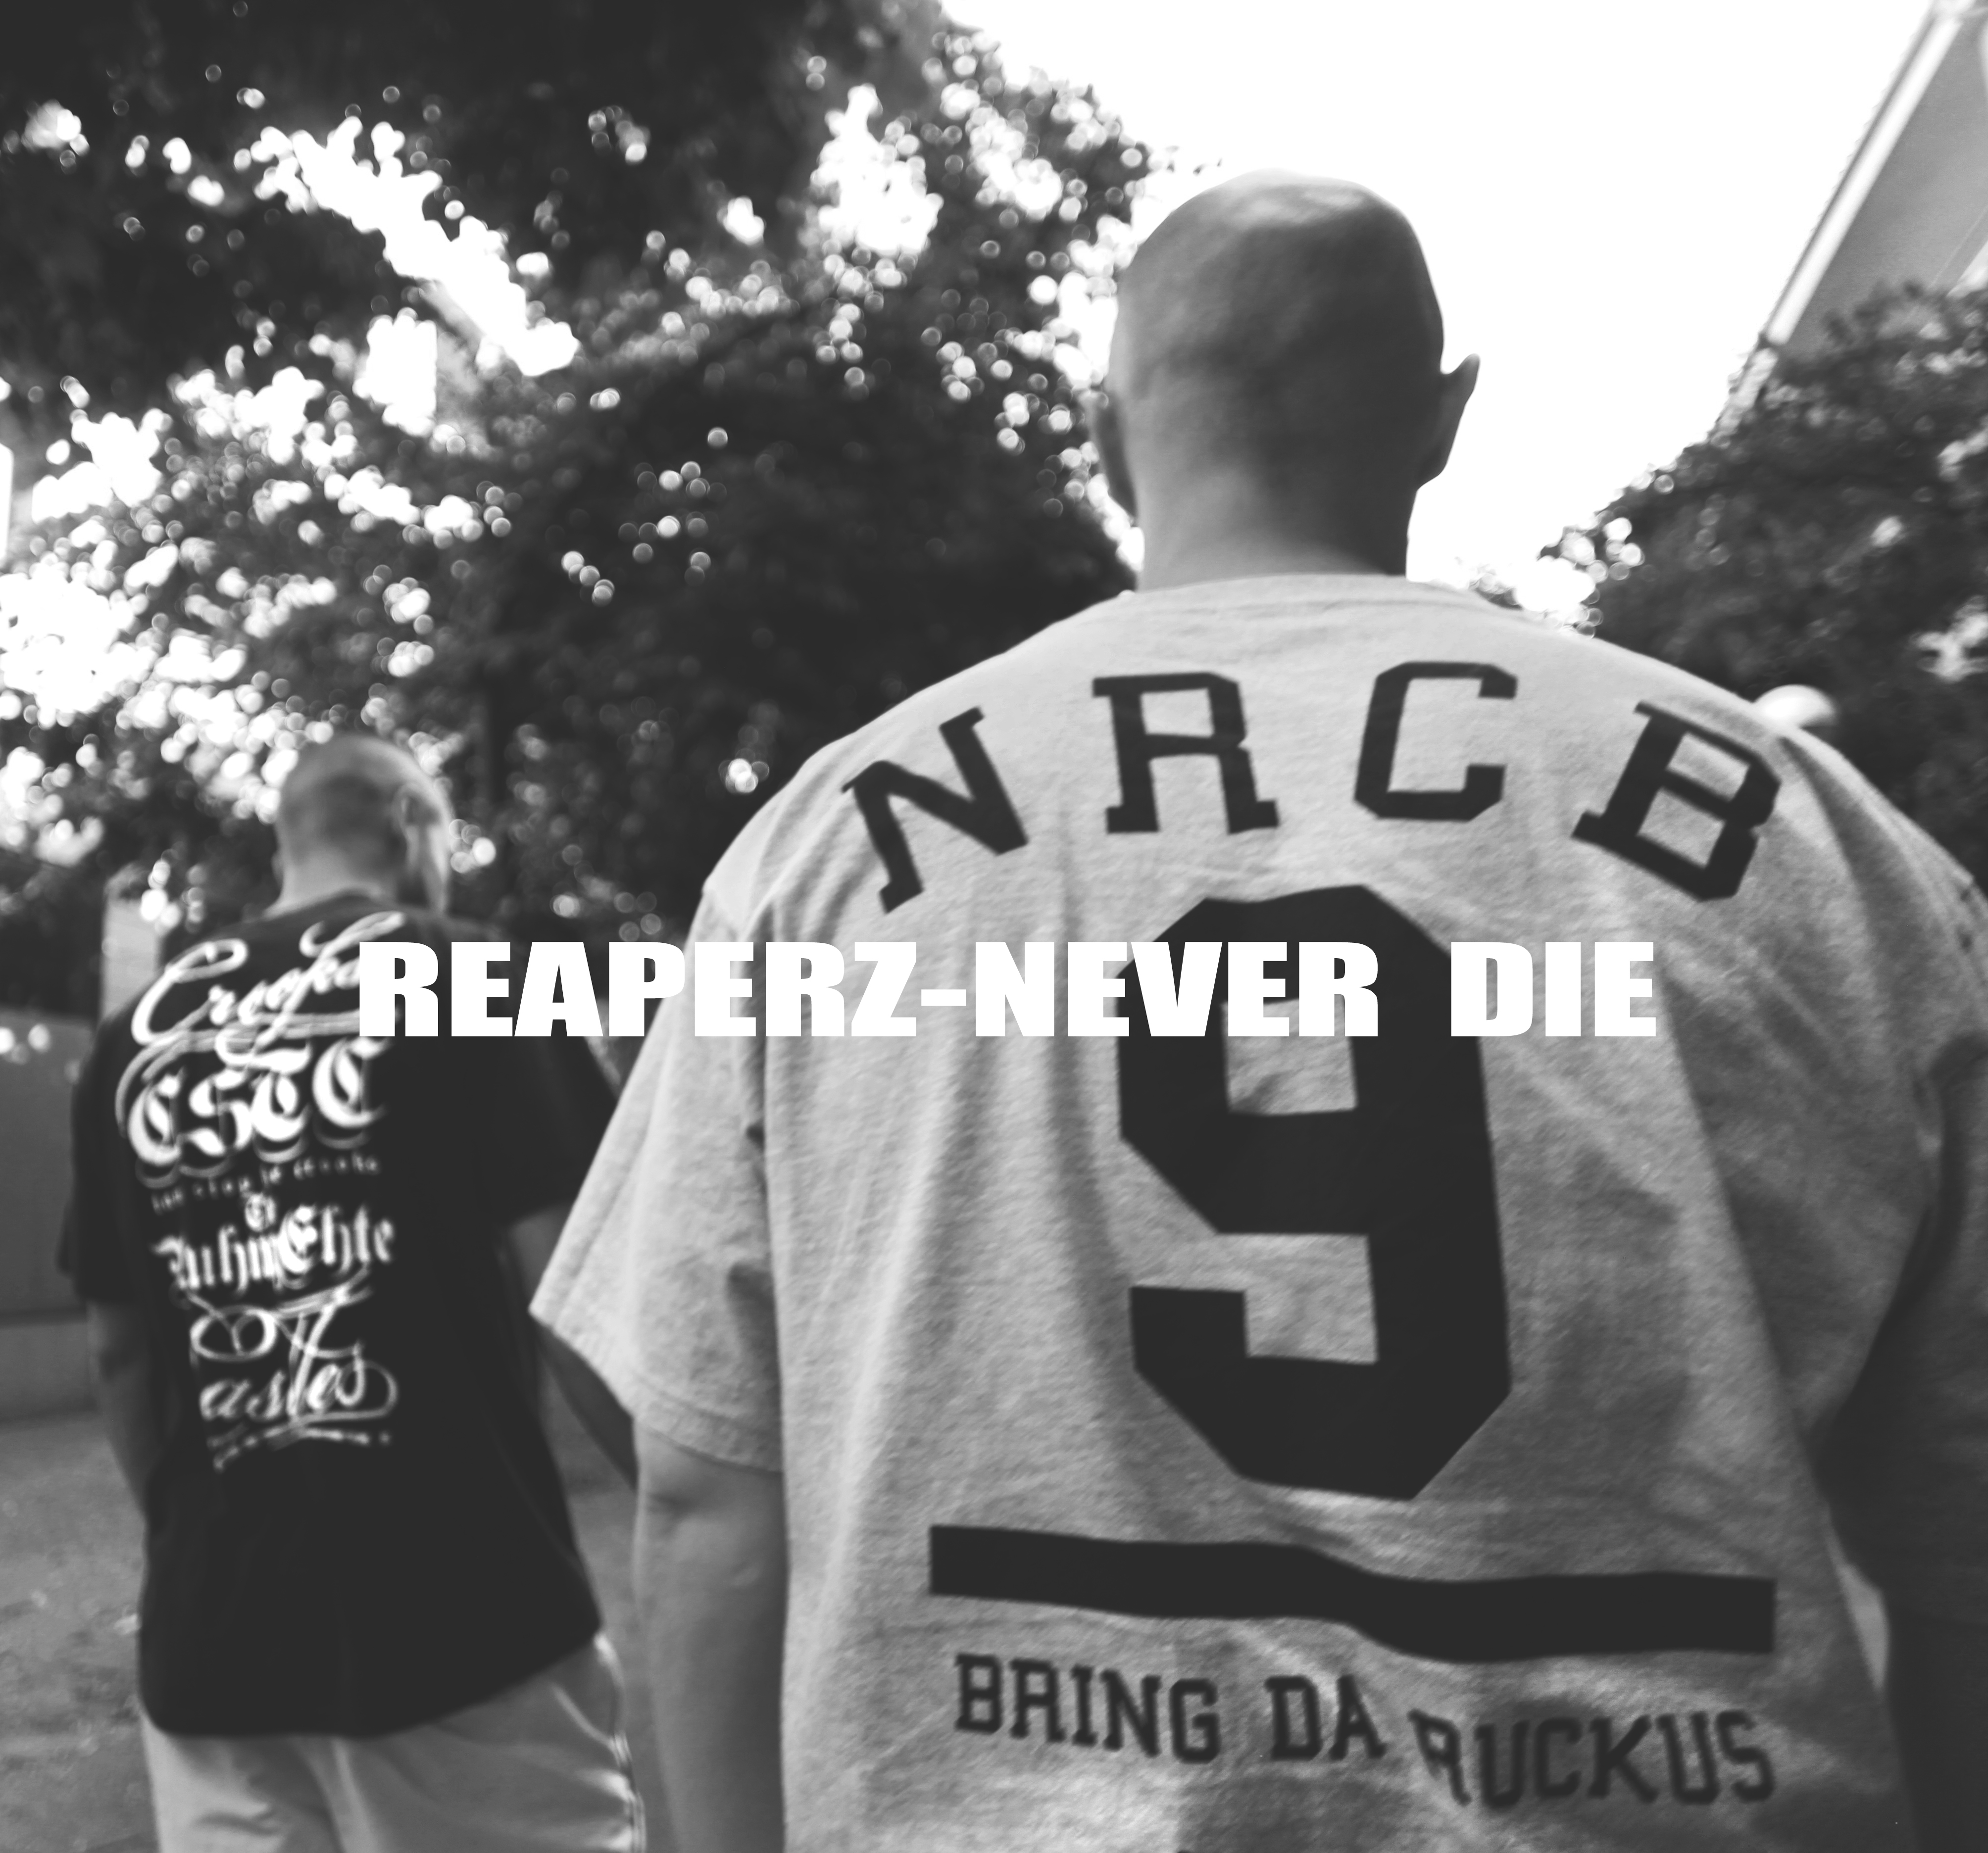 Reaperz_-_never_die